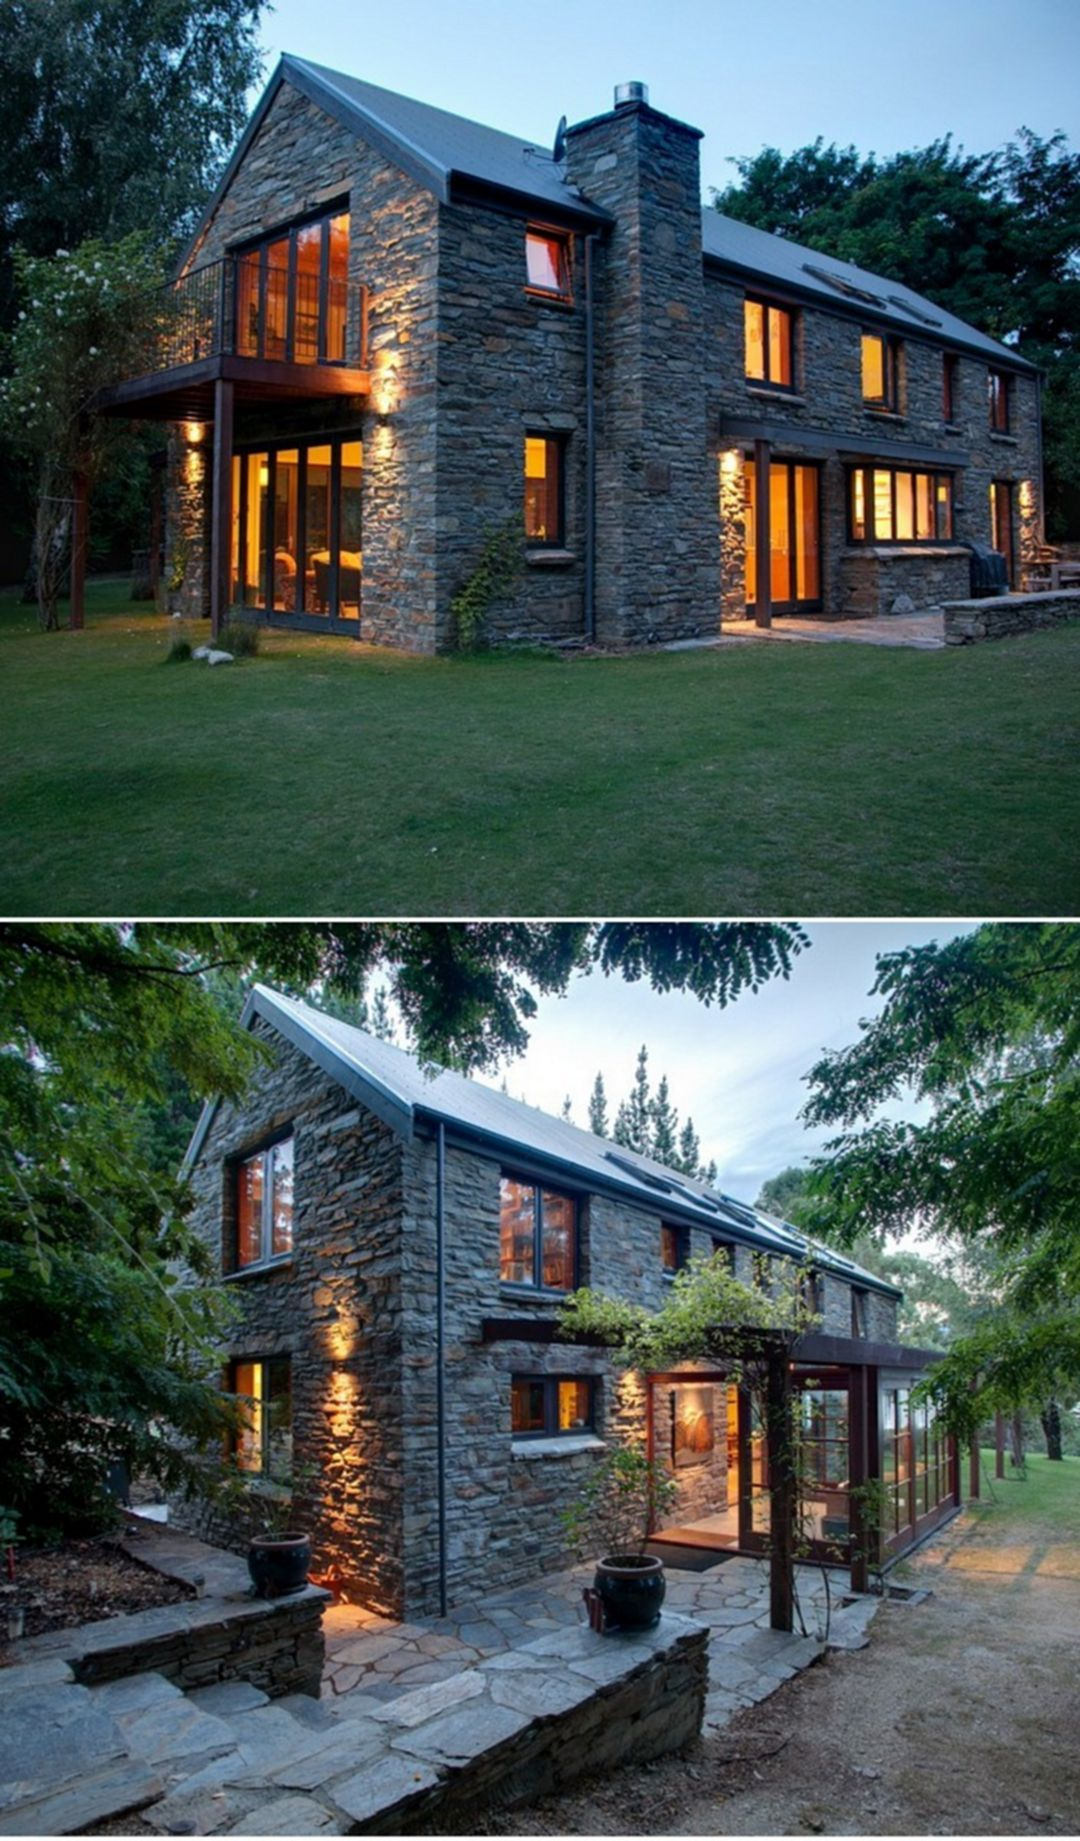 25 Beautiful Stone House Design Ideas On A Budget In 2020 Modern Farmhouse Exterior House Exterior Stone Houses